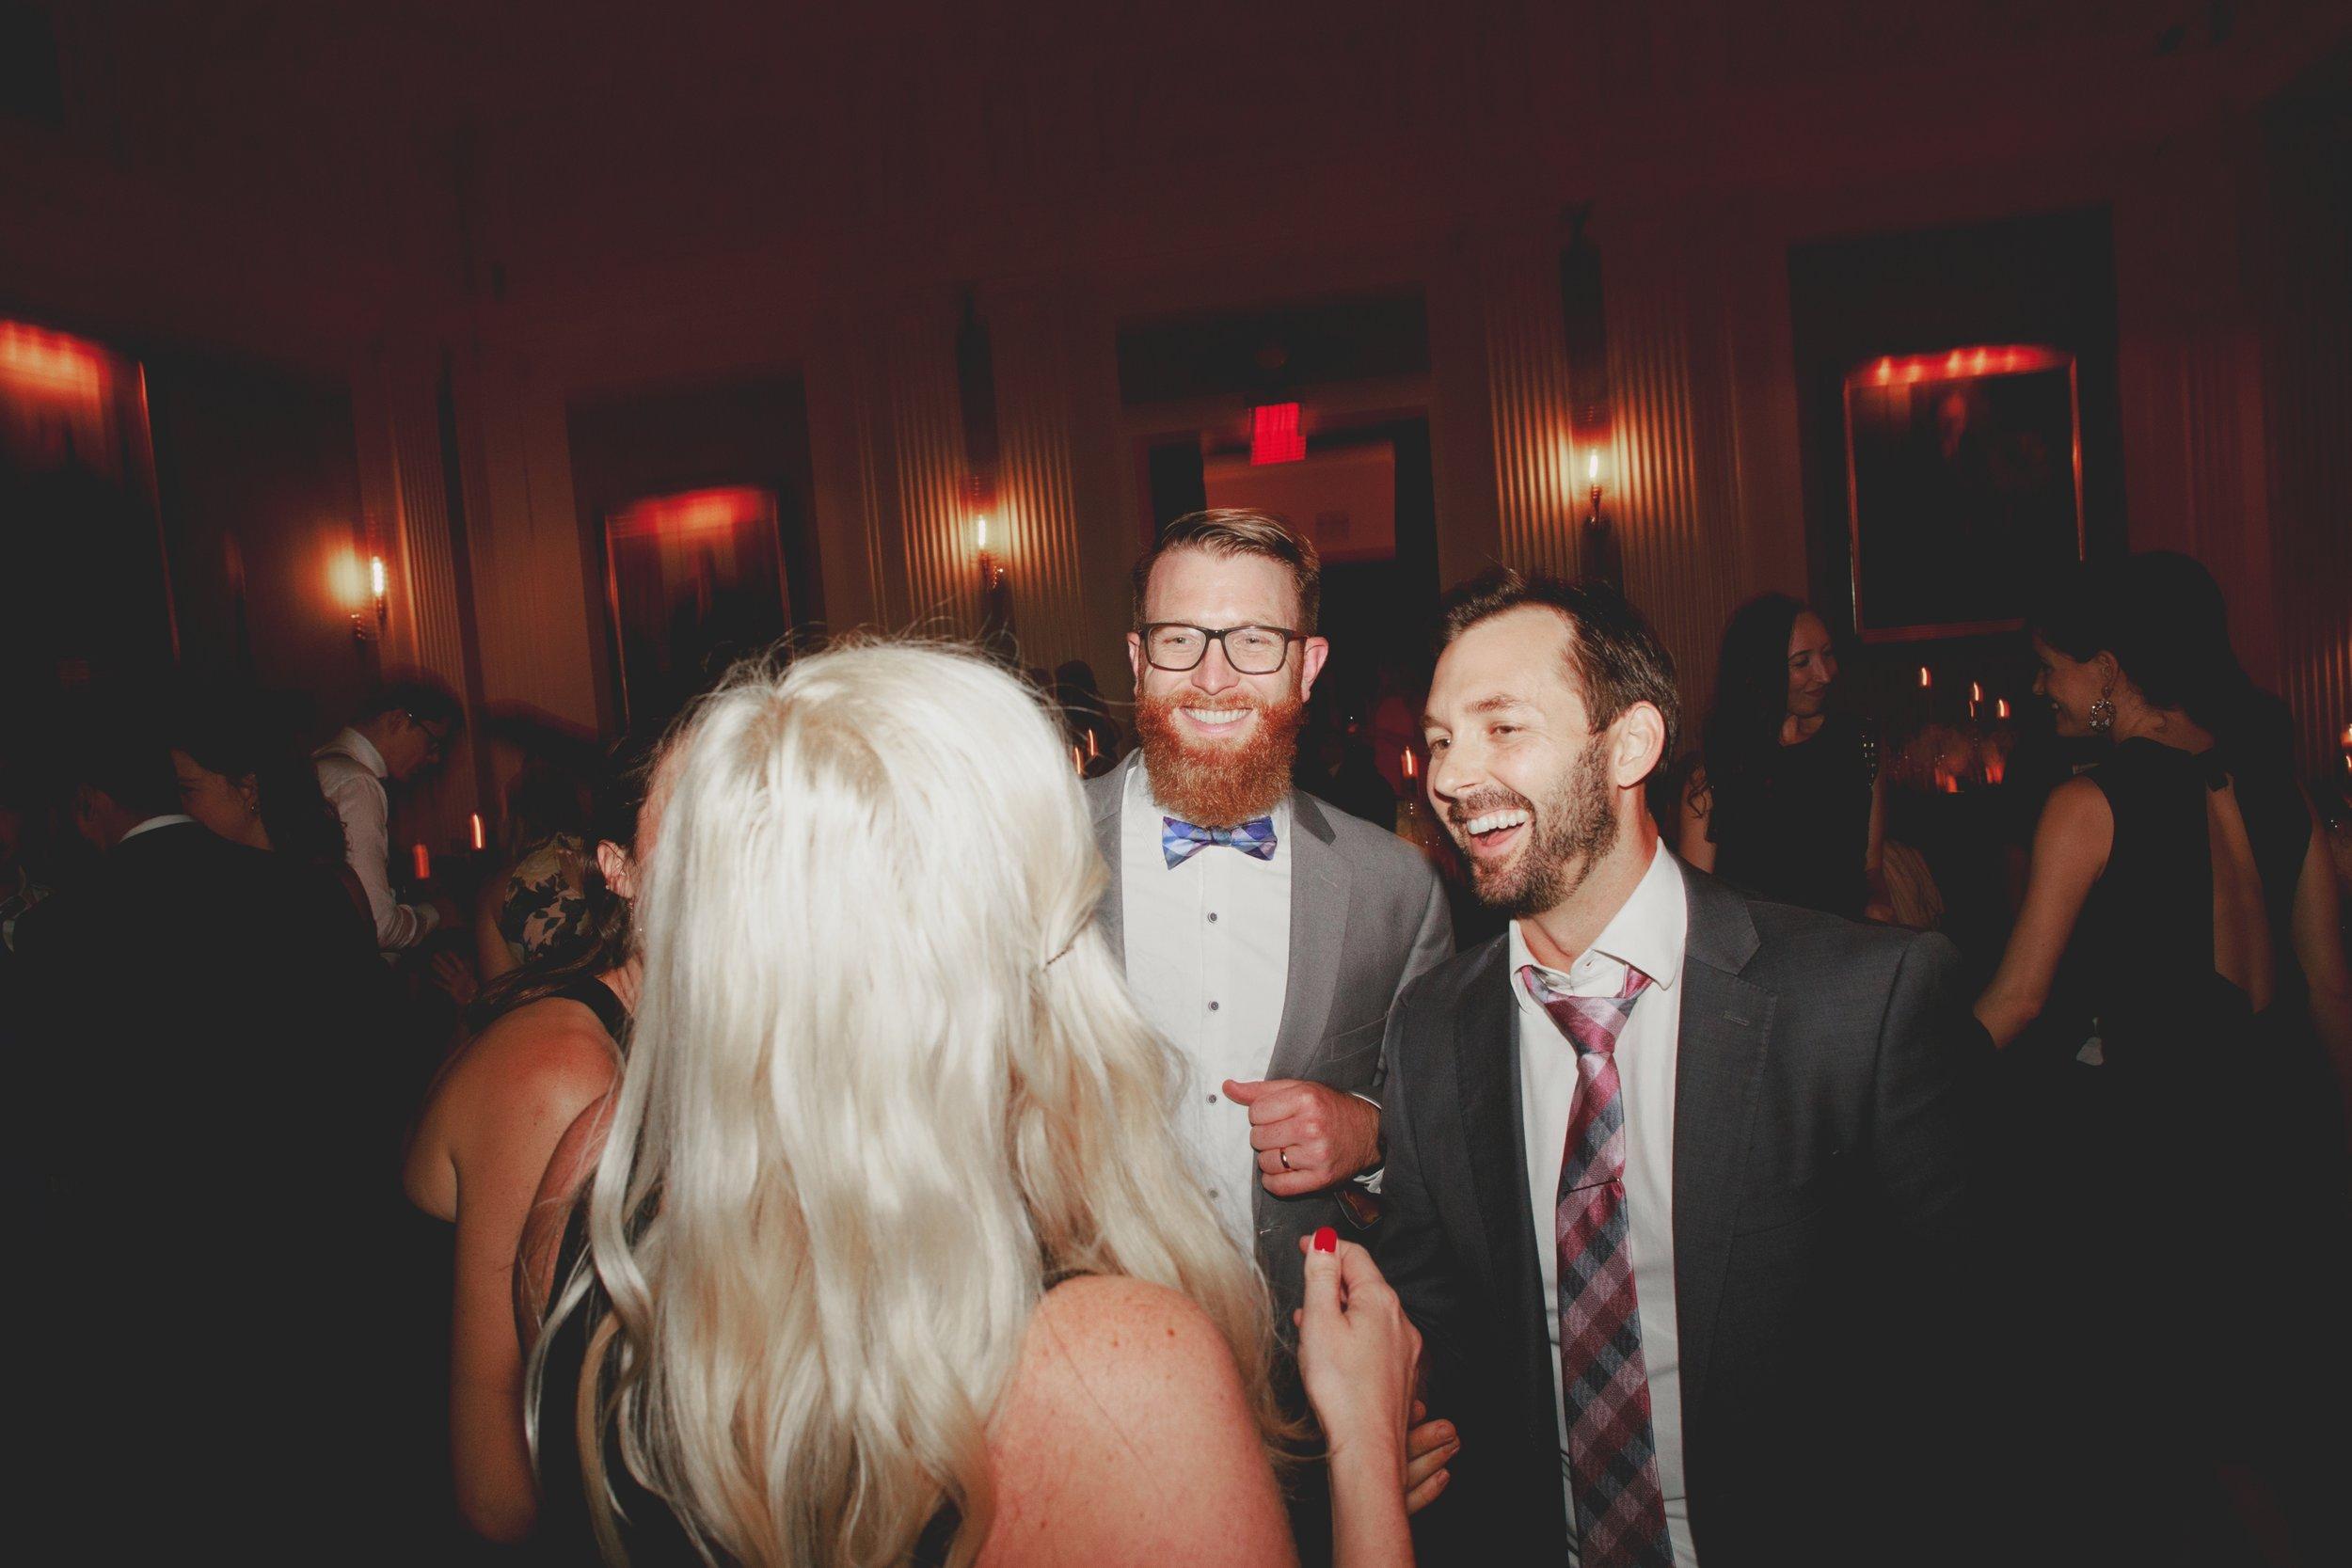 amanda_vanvels_new_york_lgbtq_gay_wedding_104.jpg